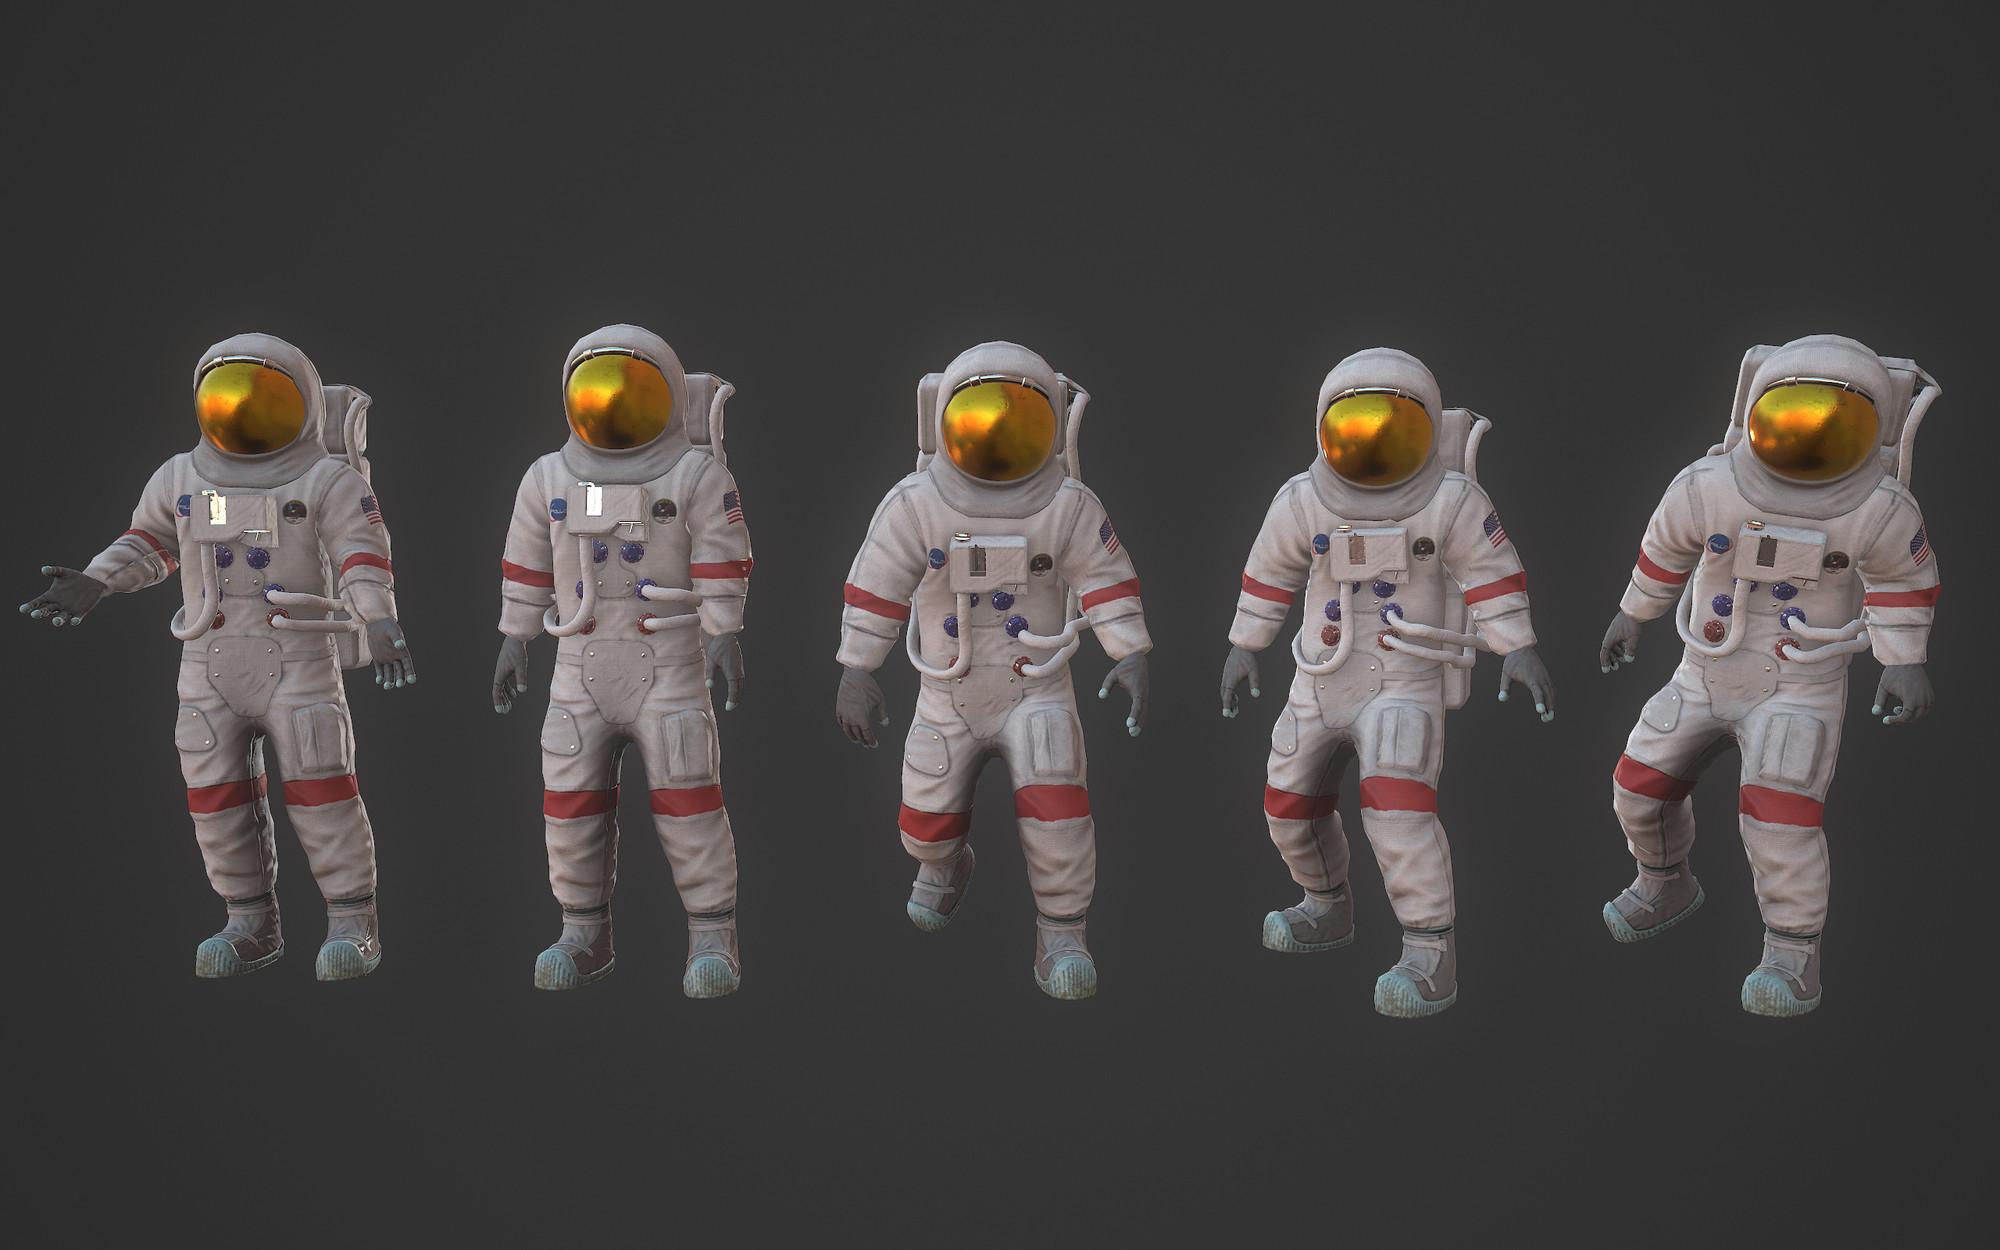 59fca22163c00_Astronaut_PosesOne.thumb.jpg.428ca5c89698042e39cbdbeb0da90166.jpg